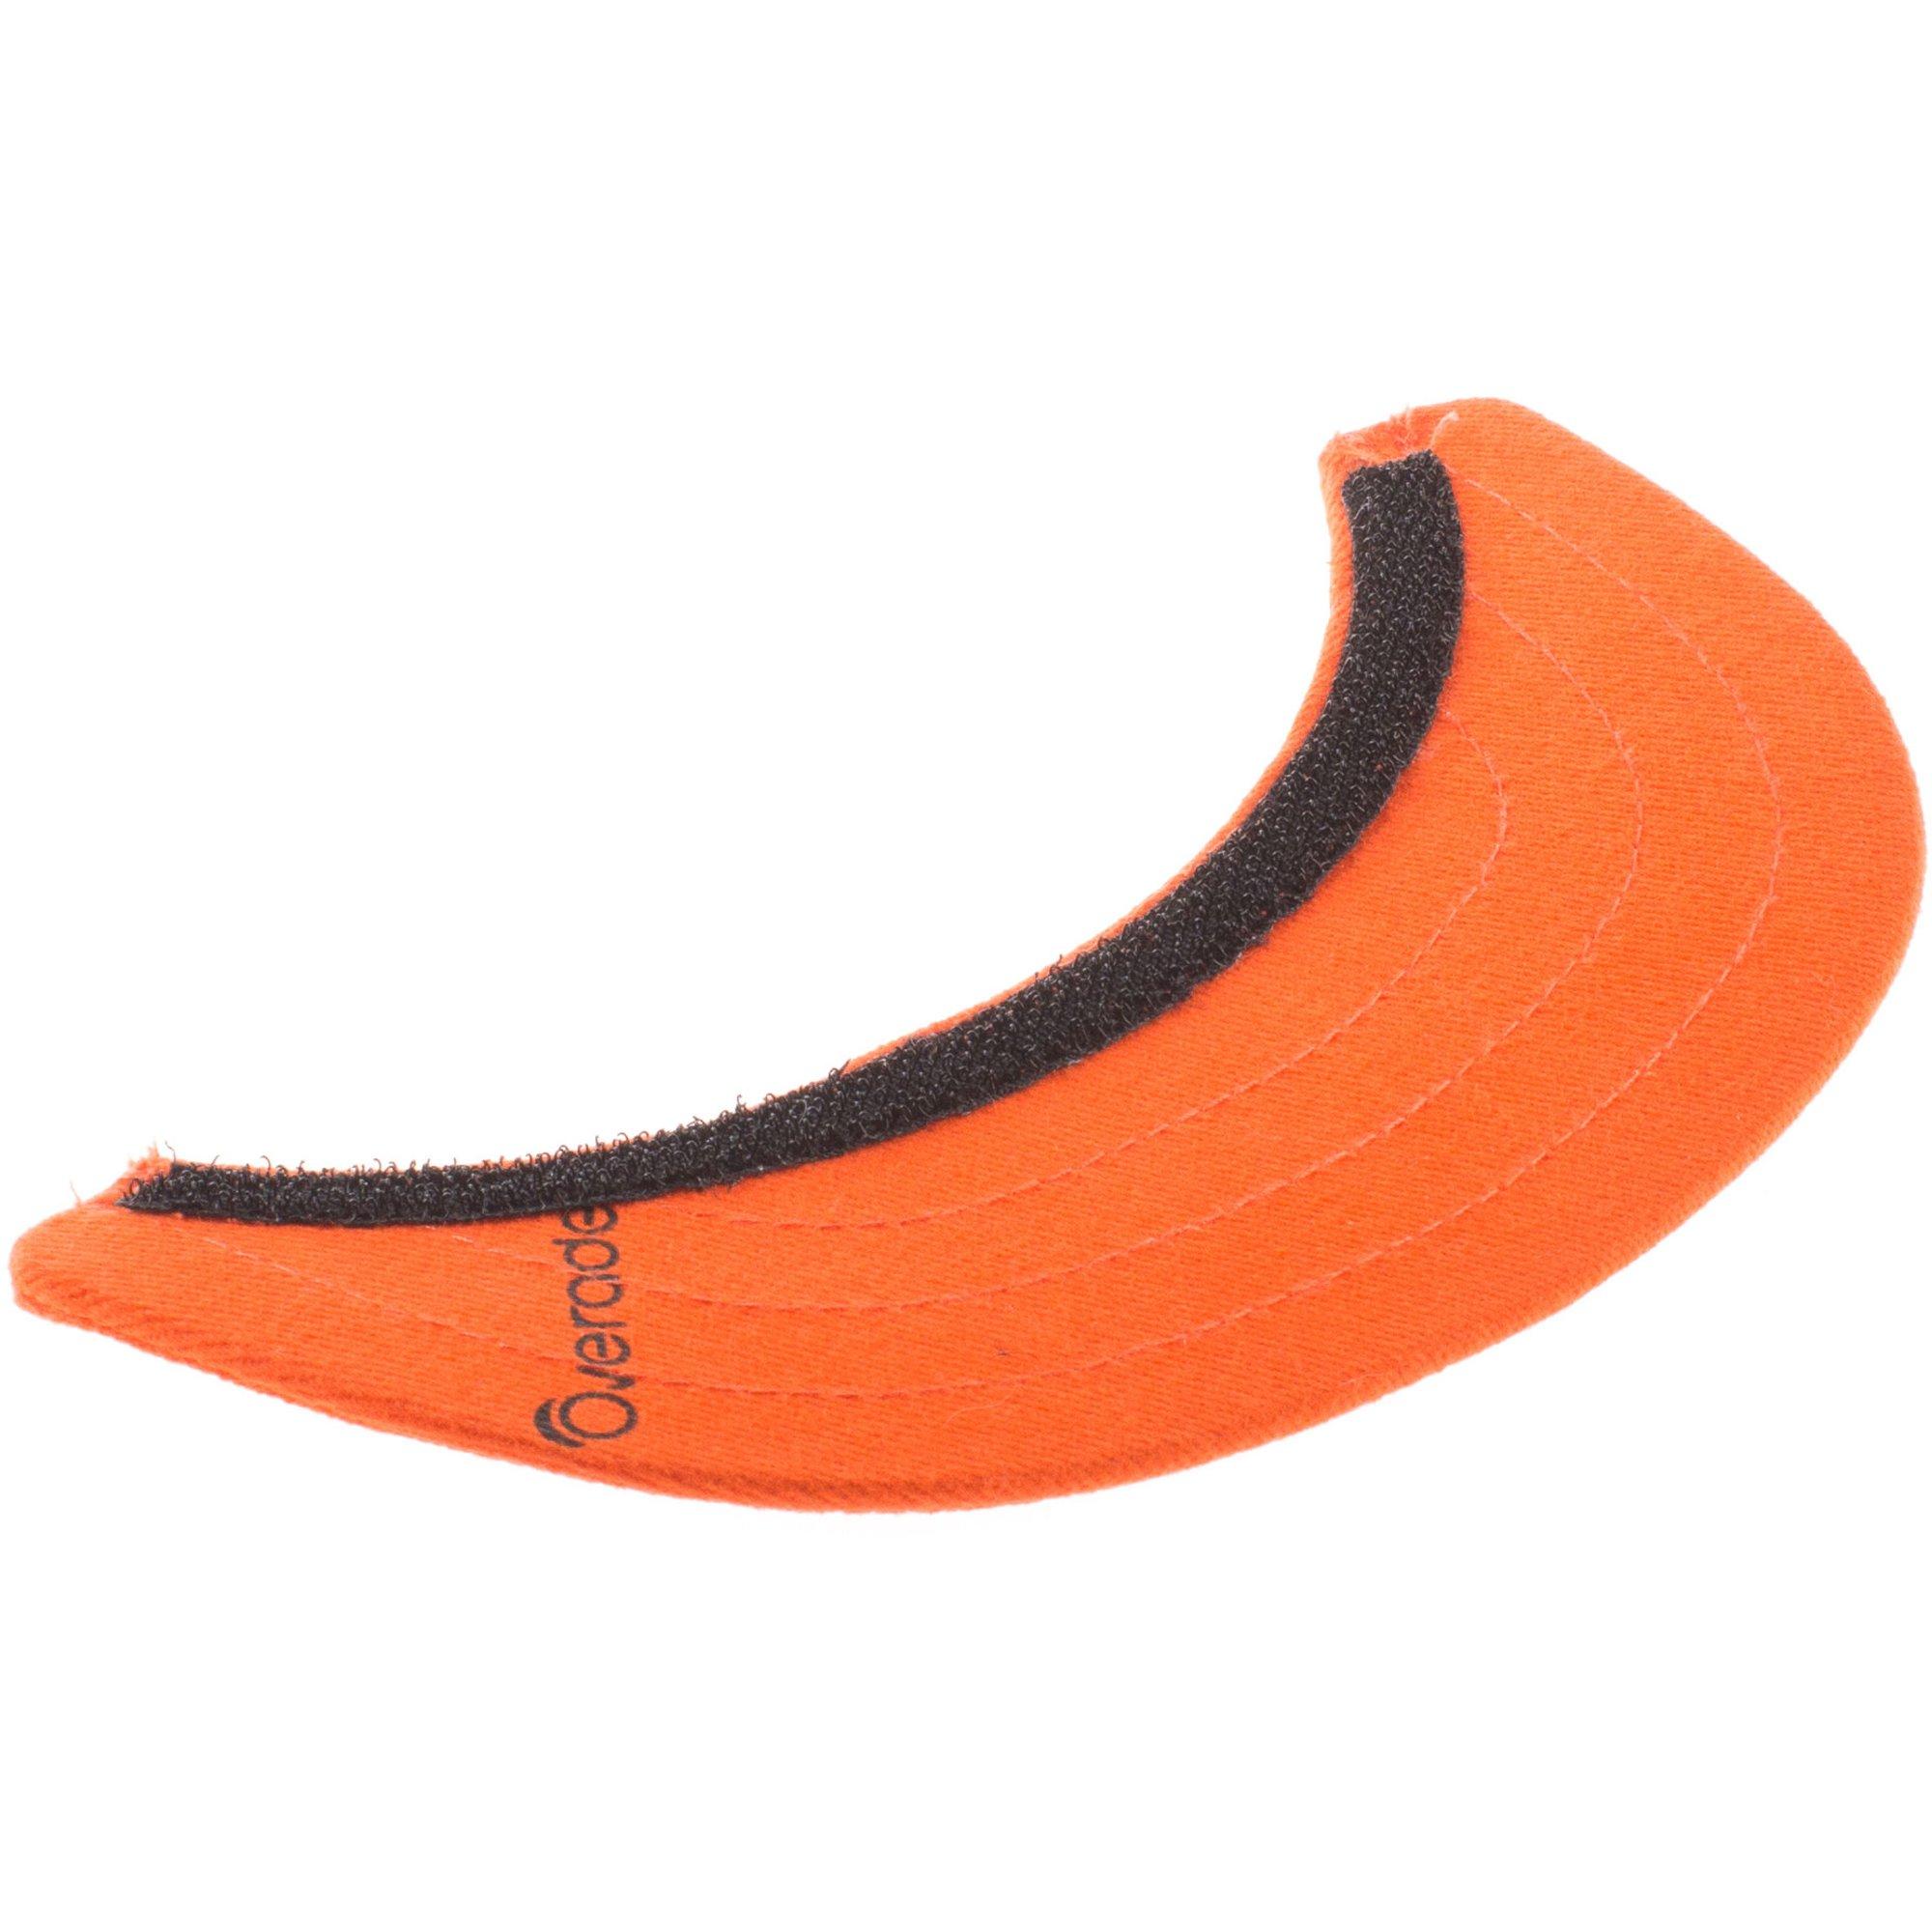 Overade Plixi skärm, orange